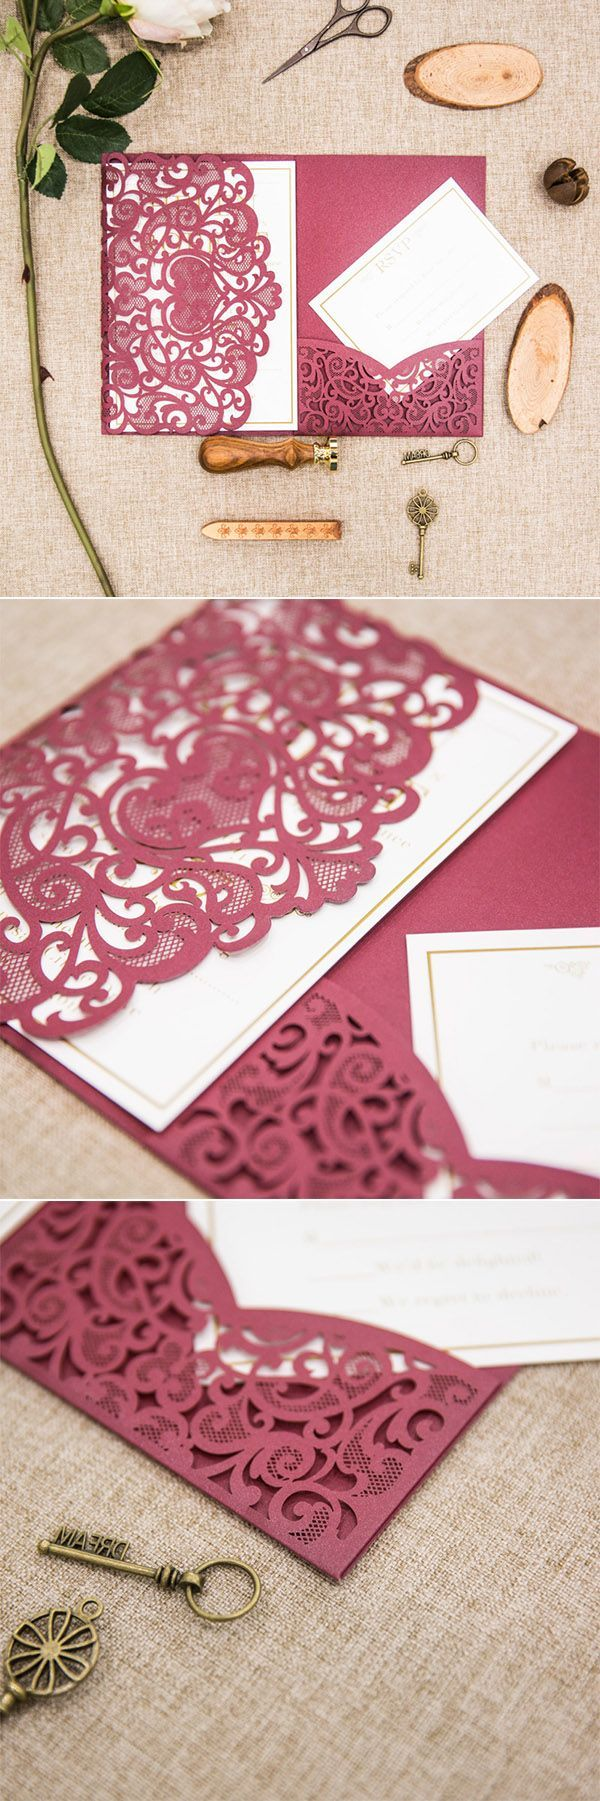 best convite images on pinterest invitation cards invitations